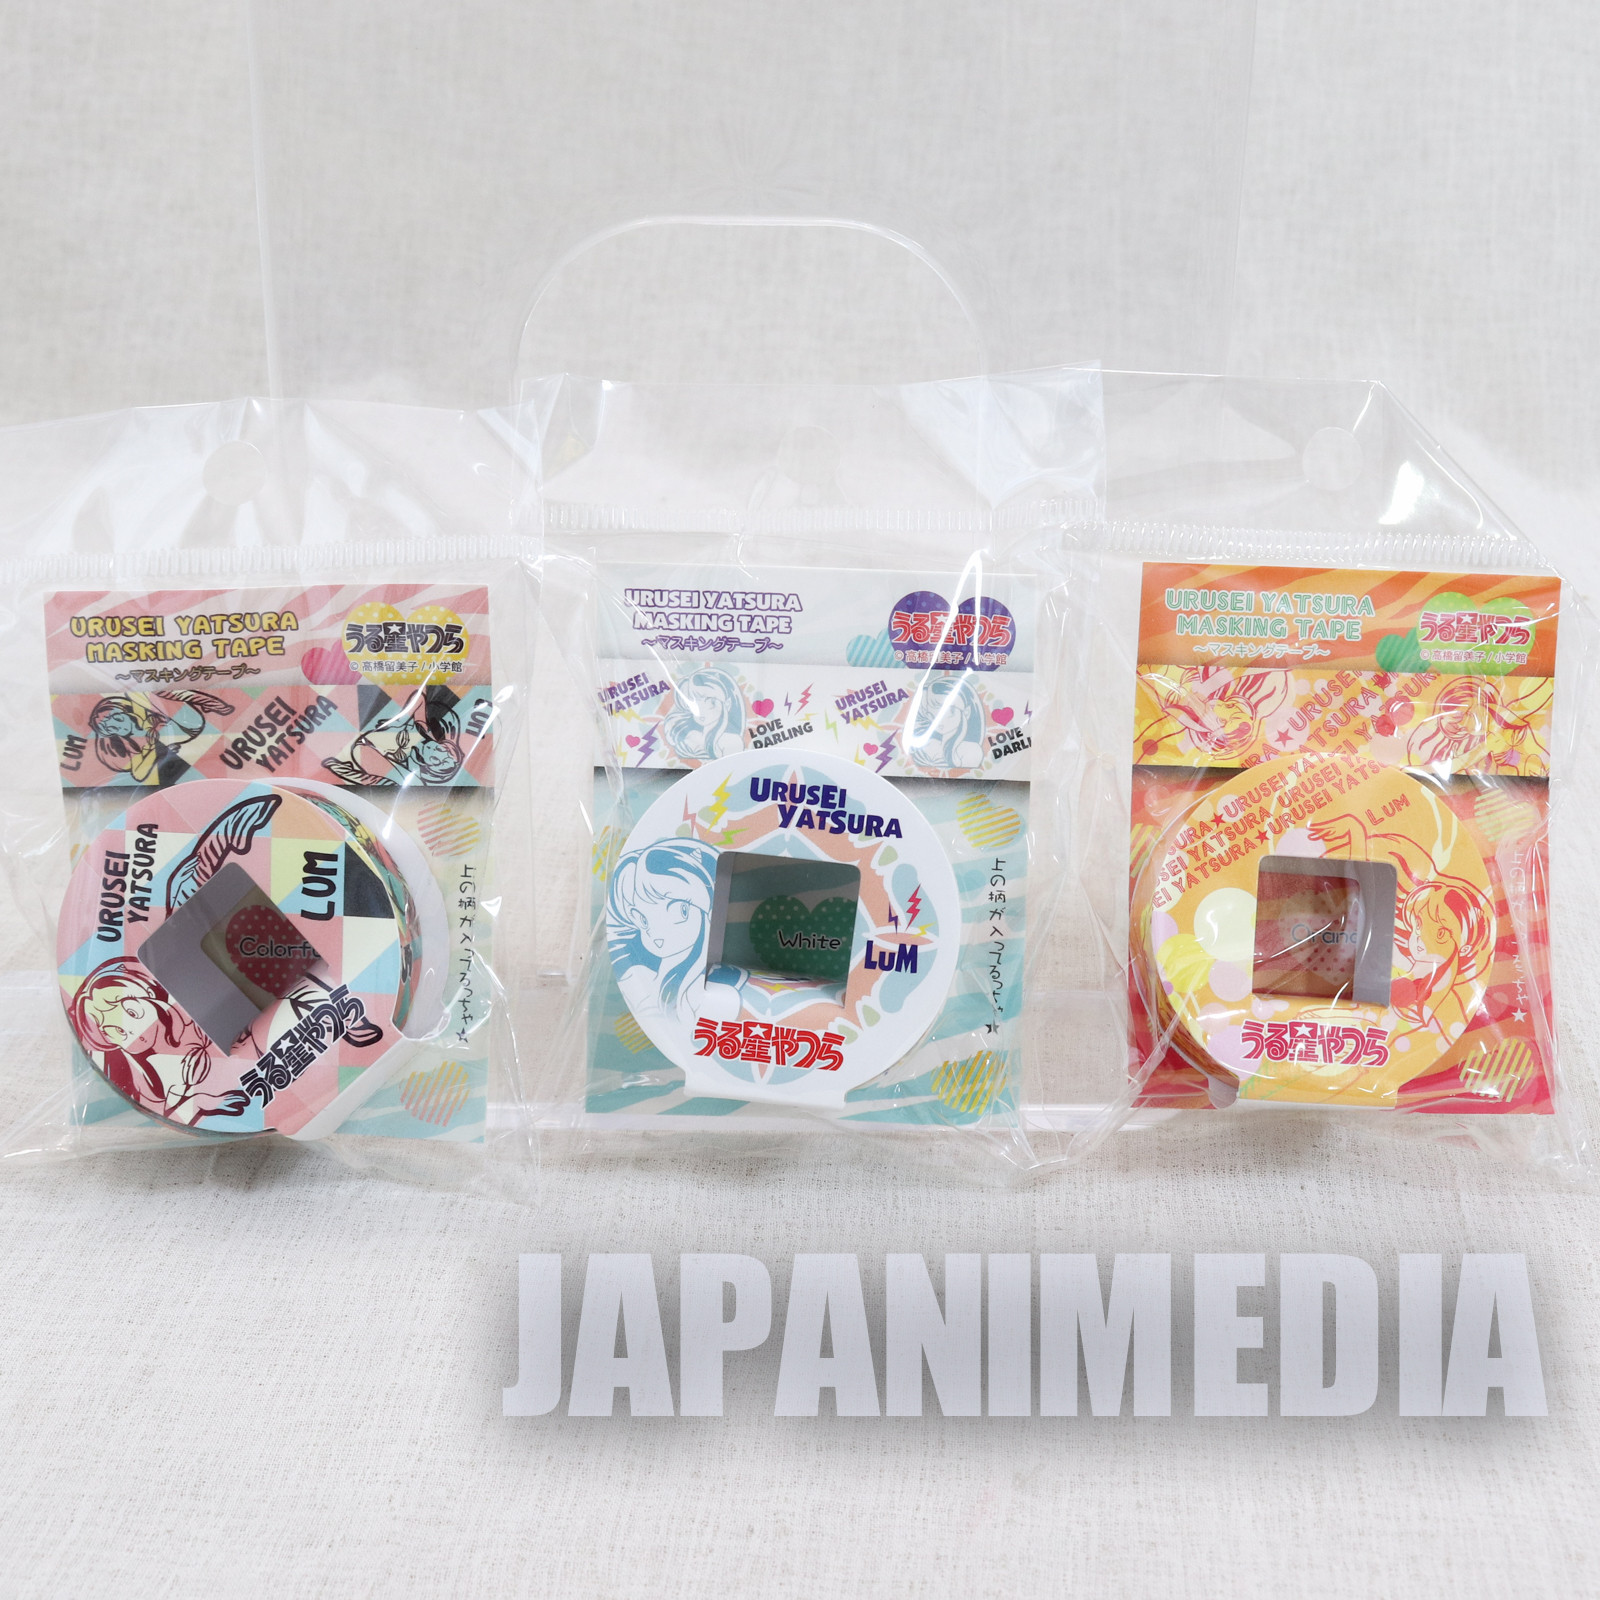 Urusei Yatsura Masking Tape 3ps Set JAPAN ANIME 1